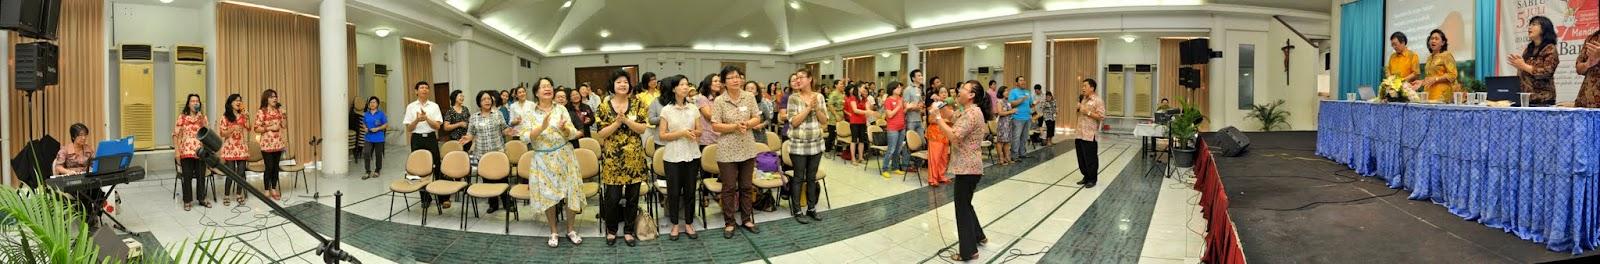 Acara Pesta Nama Lingkungan YOPE - 2014